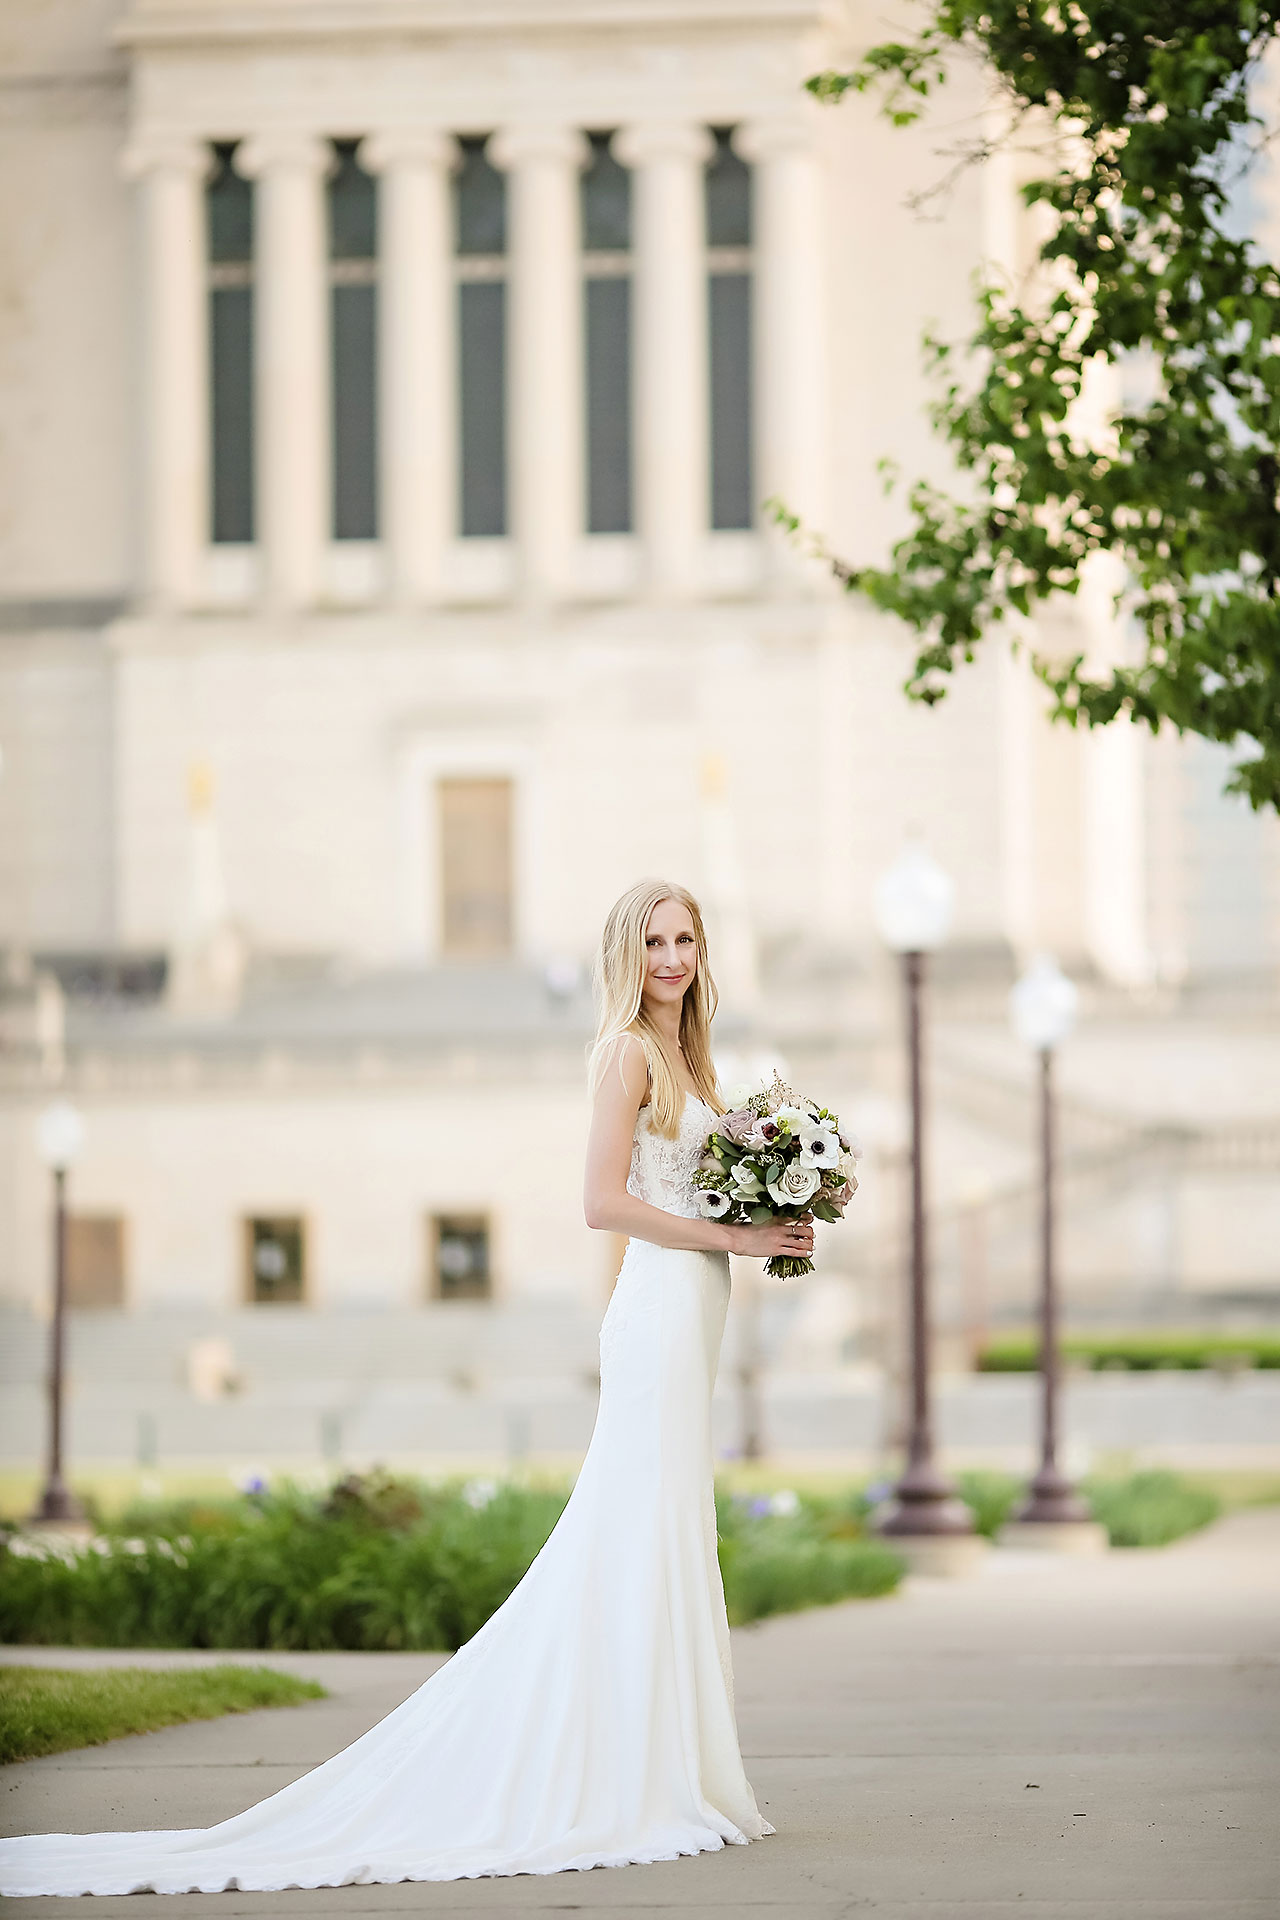 Molly Declan Scottish Rite Indianapolis Wedding 154